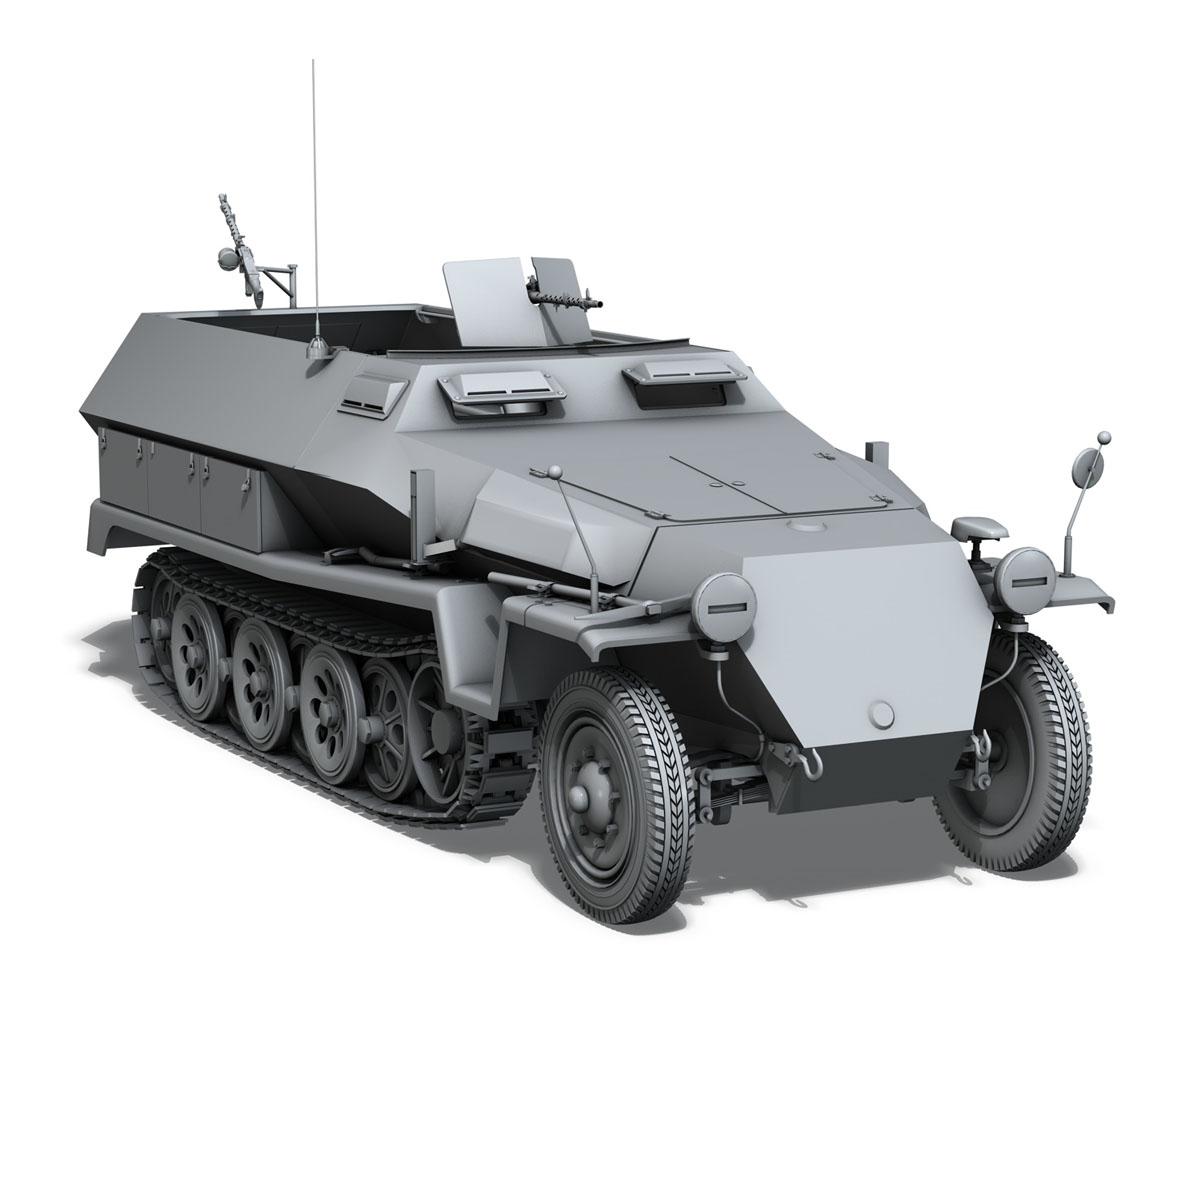 sd.kfz 251/1 ausf.c – hanomag halftruck 3d model 3ds fbx c4d lwo obj 201169